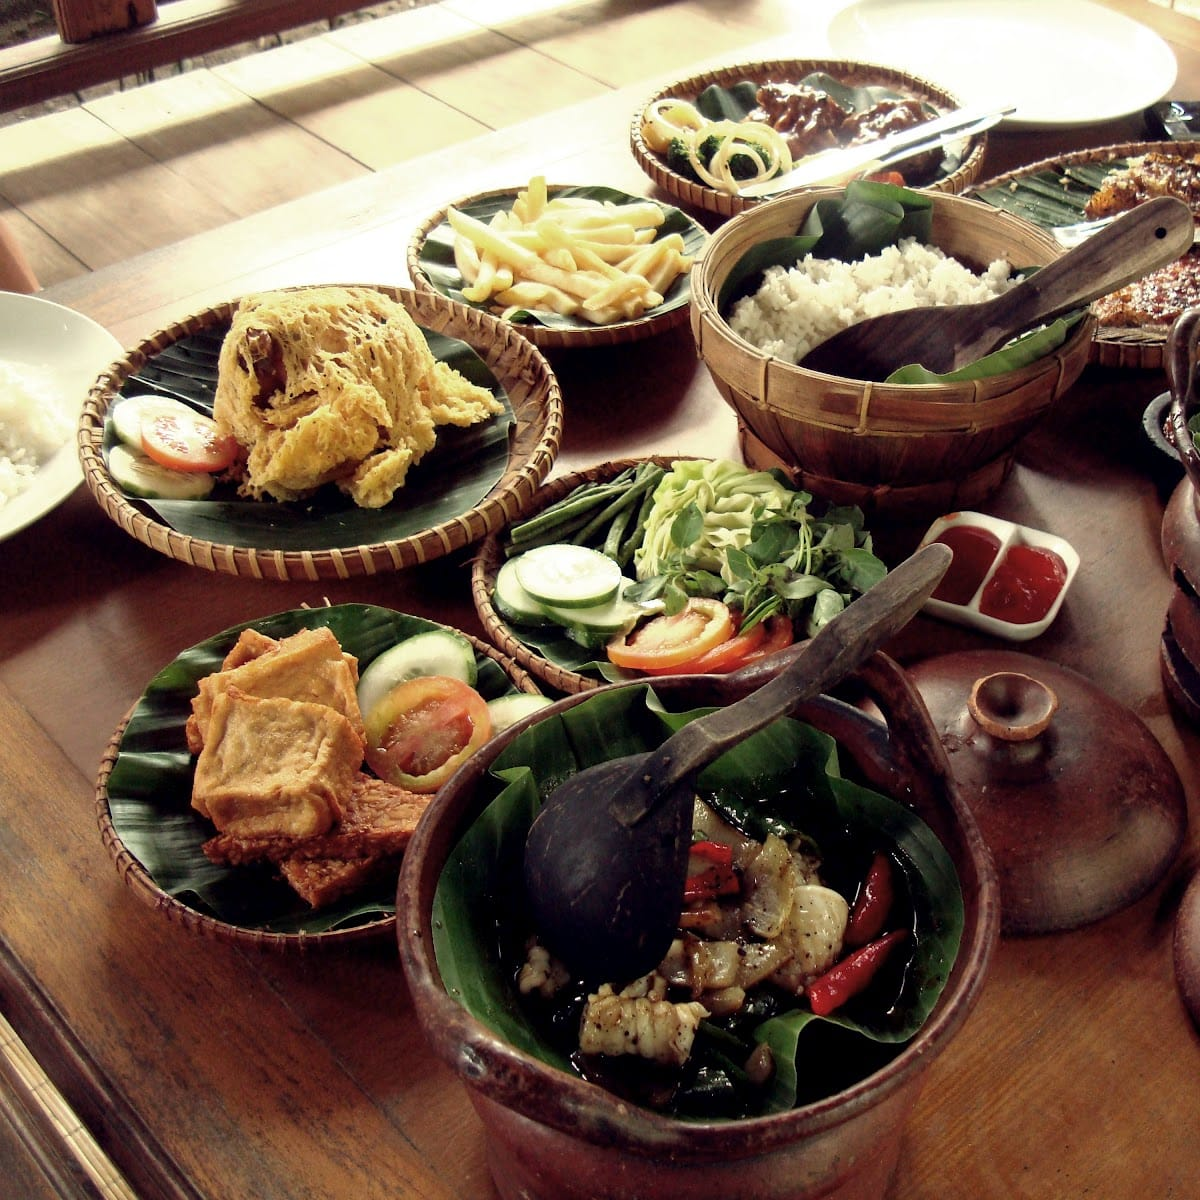 Java Travel Guide   Republic of Indonesia Travel Guide  Bali Tourist Destinations: xxx YOGYAKARTA FOOD